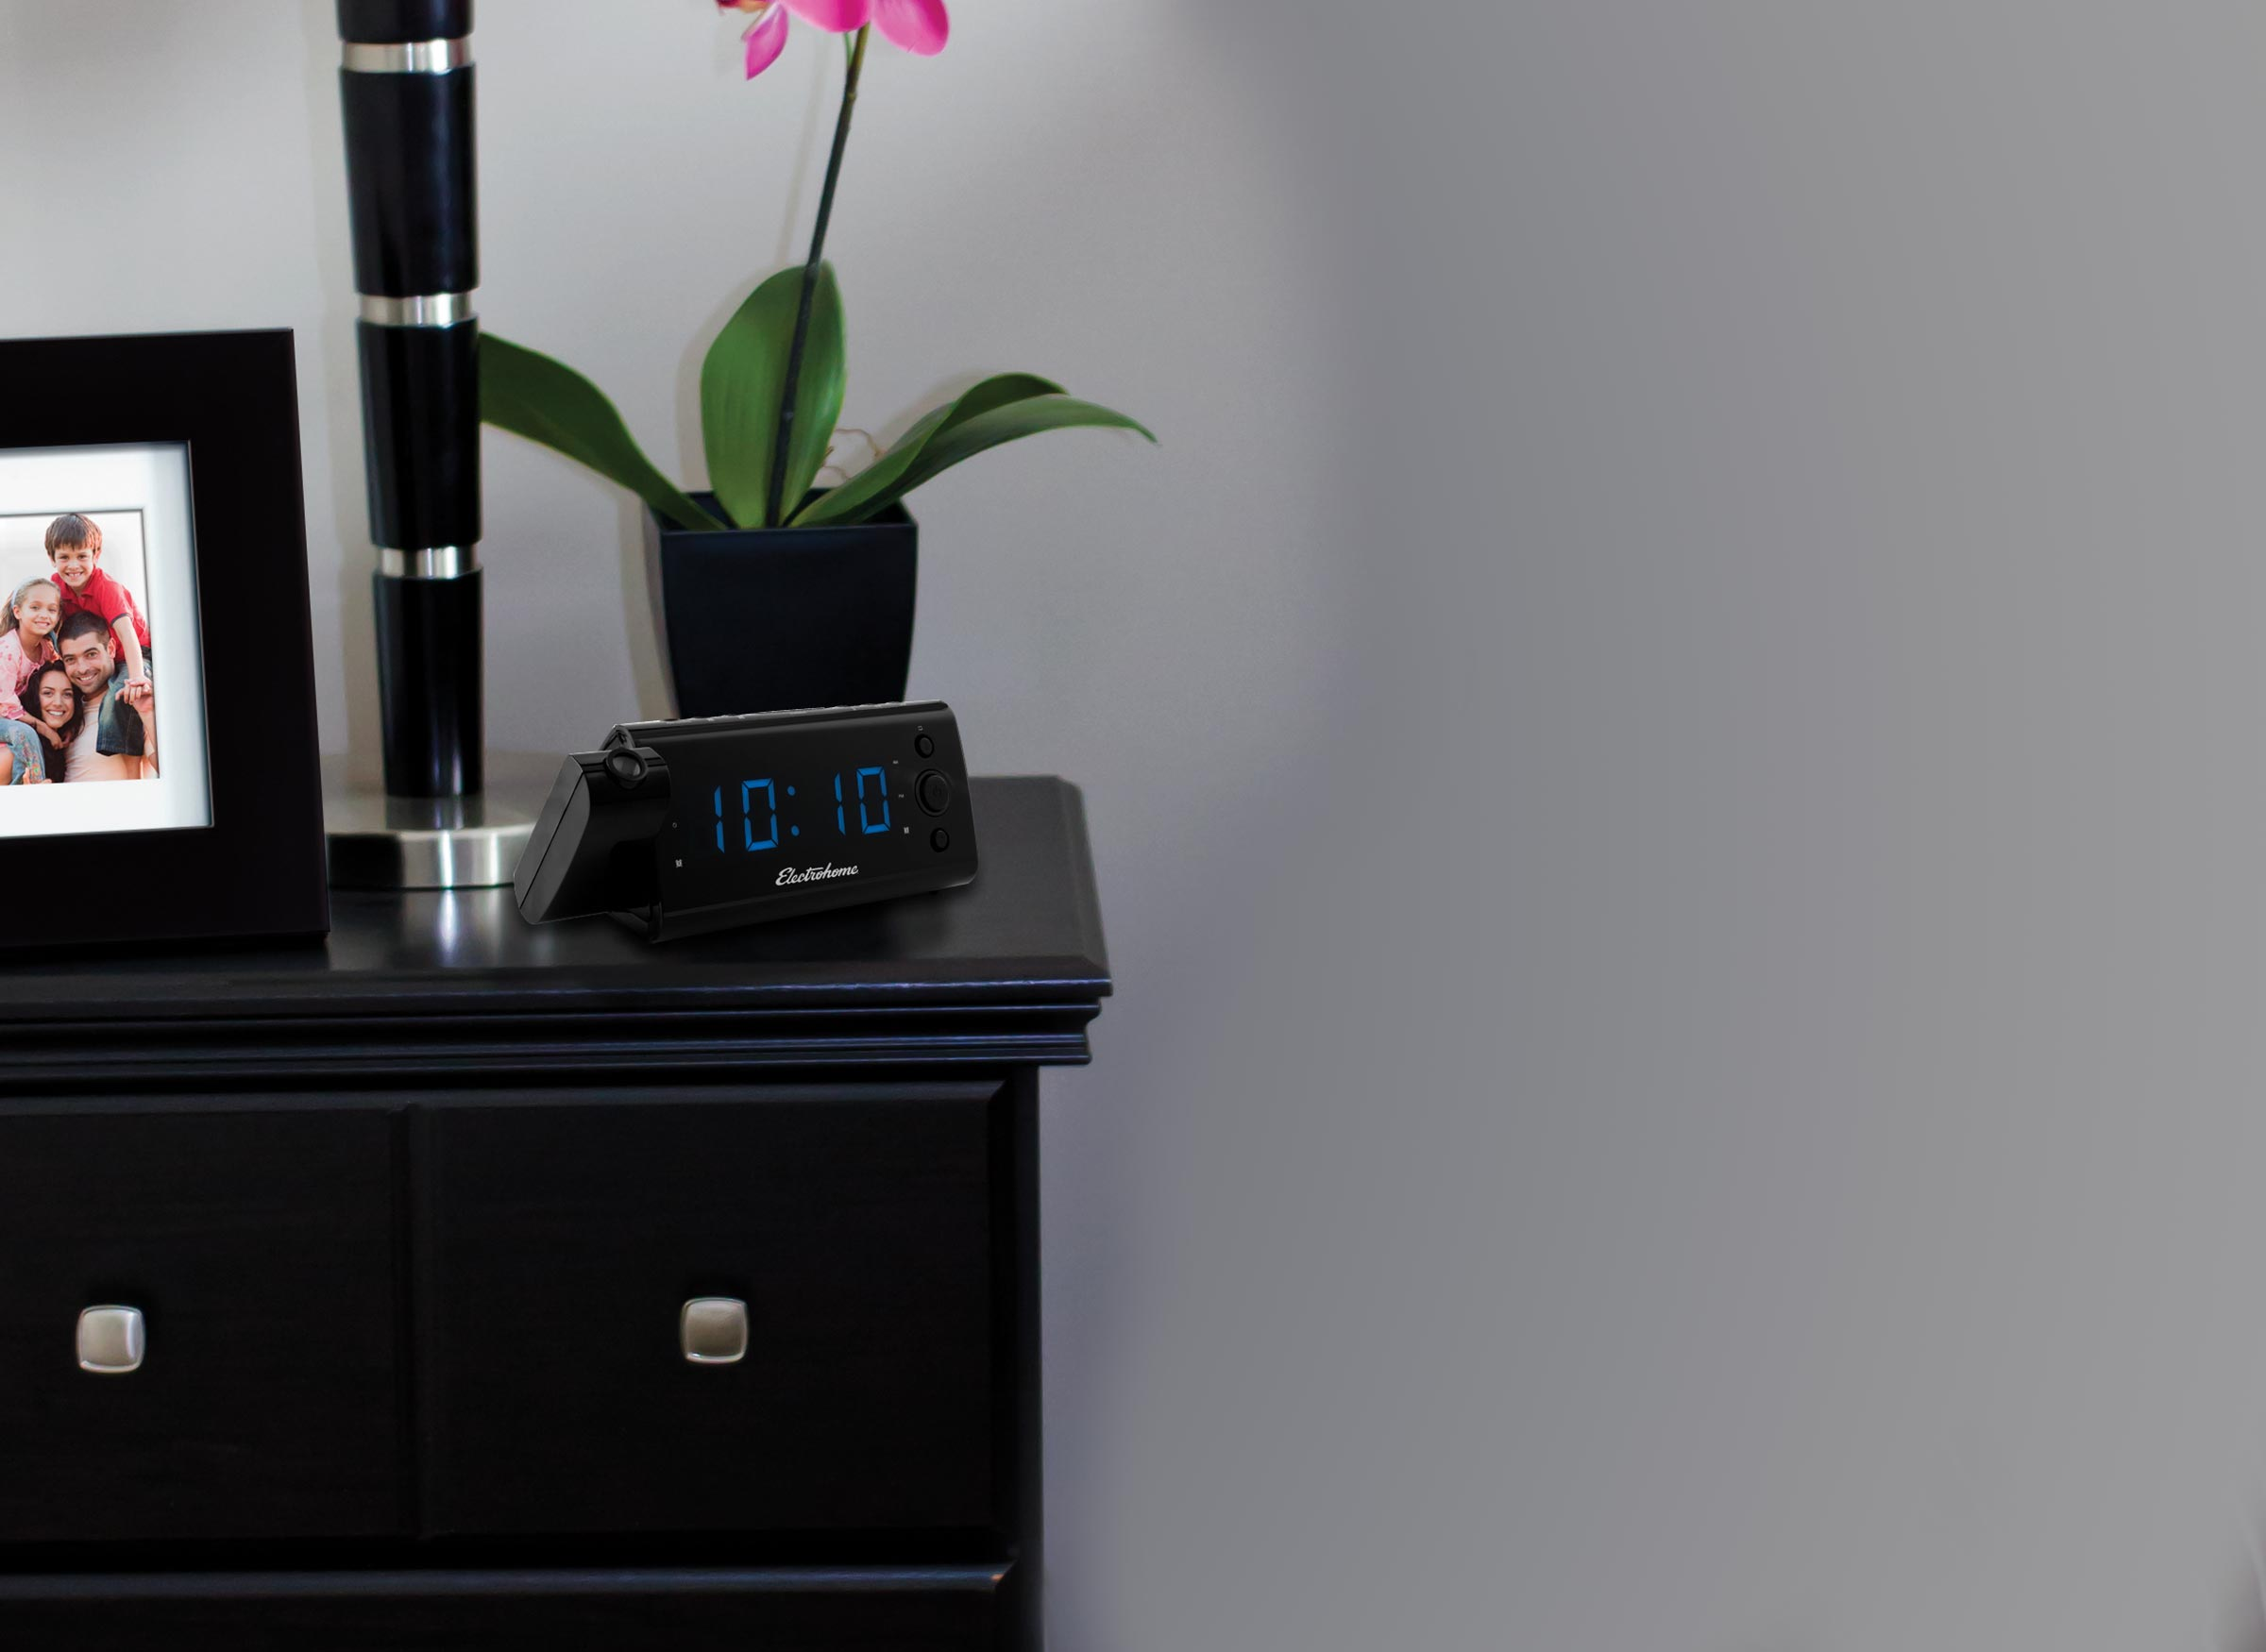 electrohome alarm clock manual eaac201